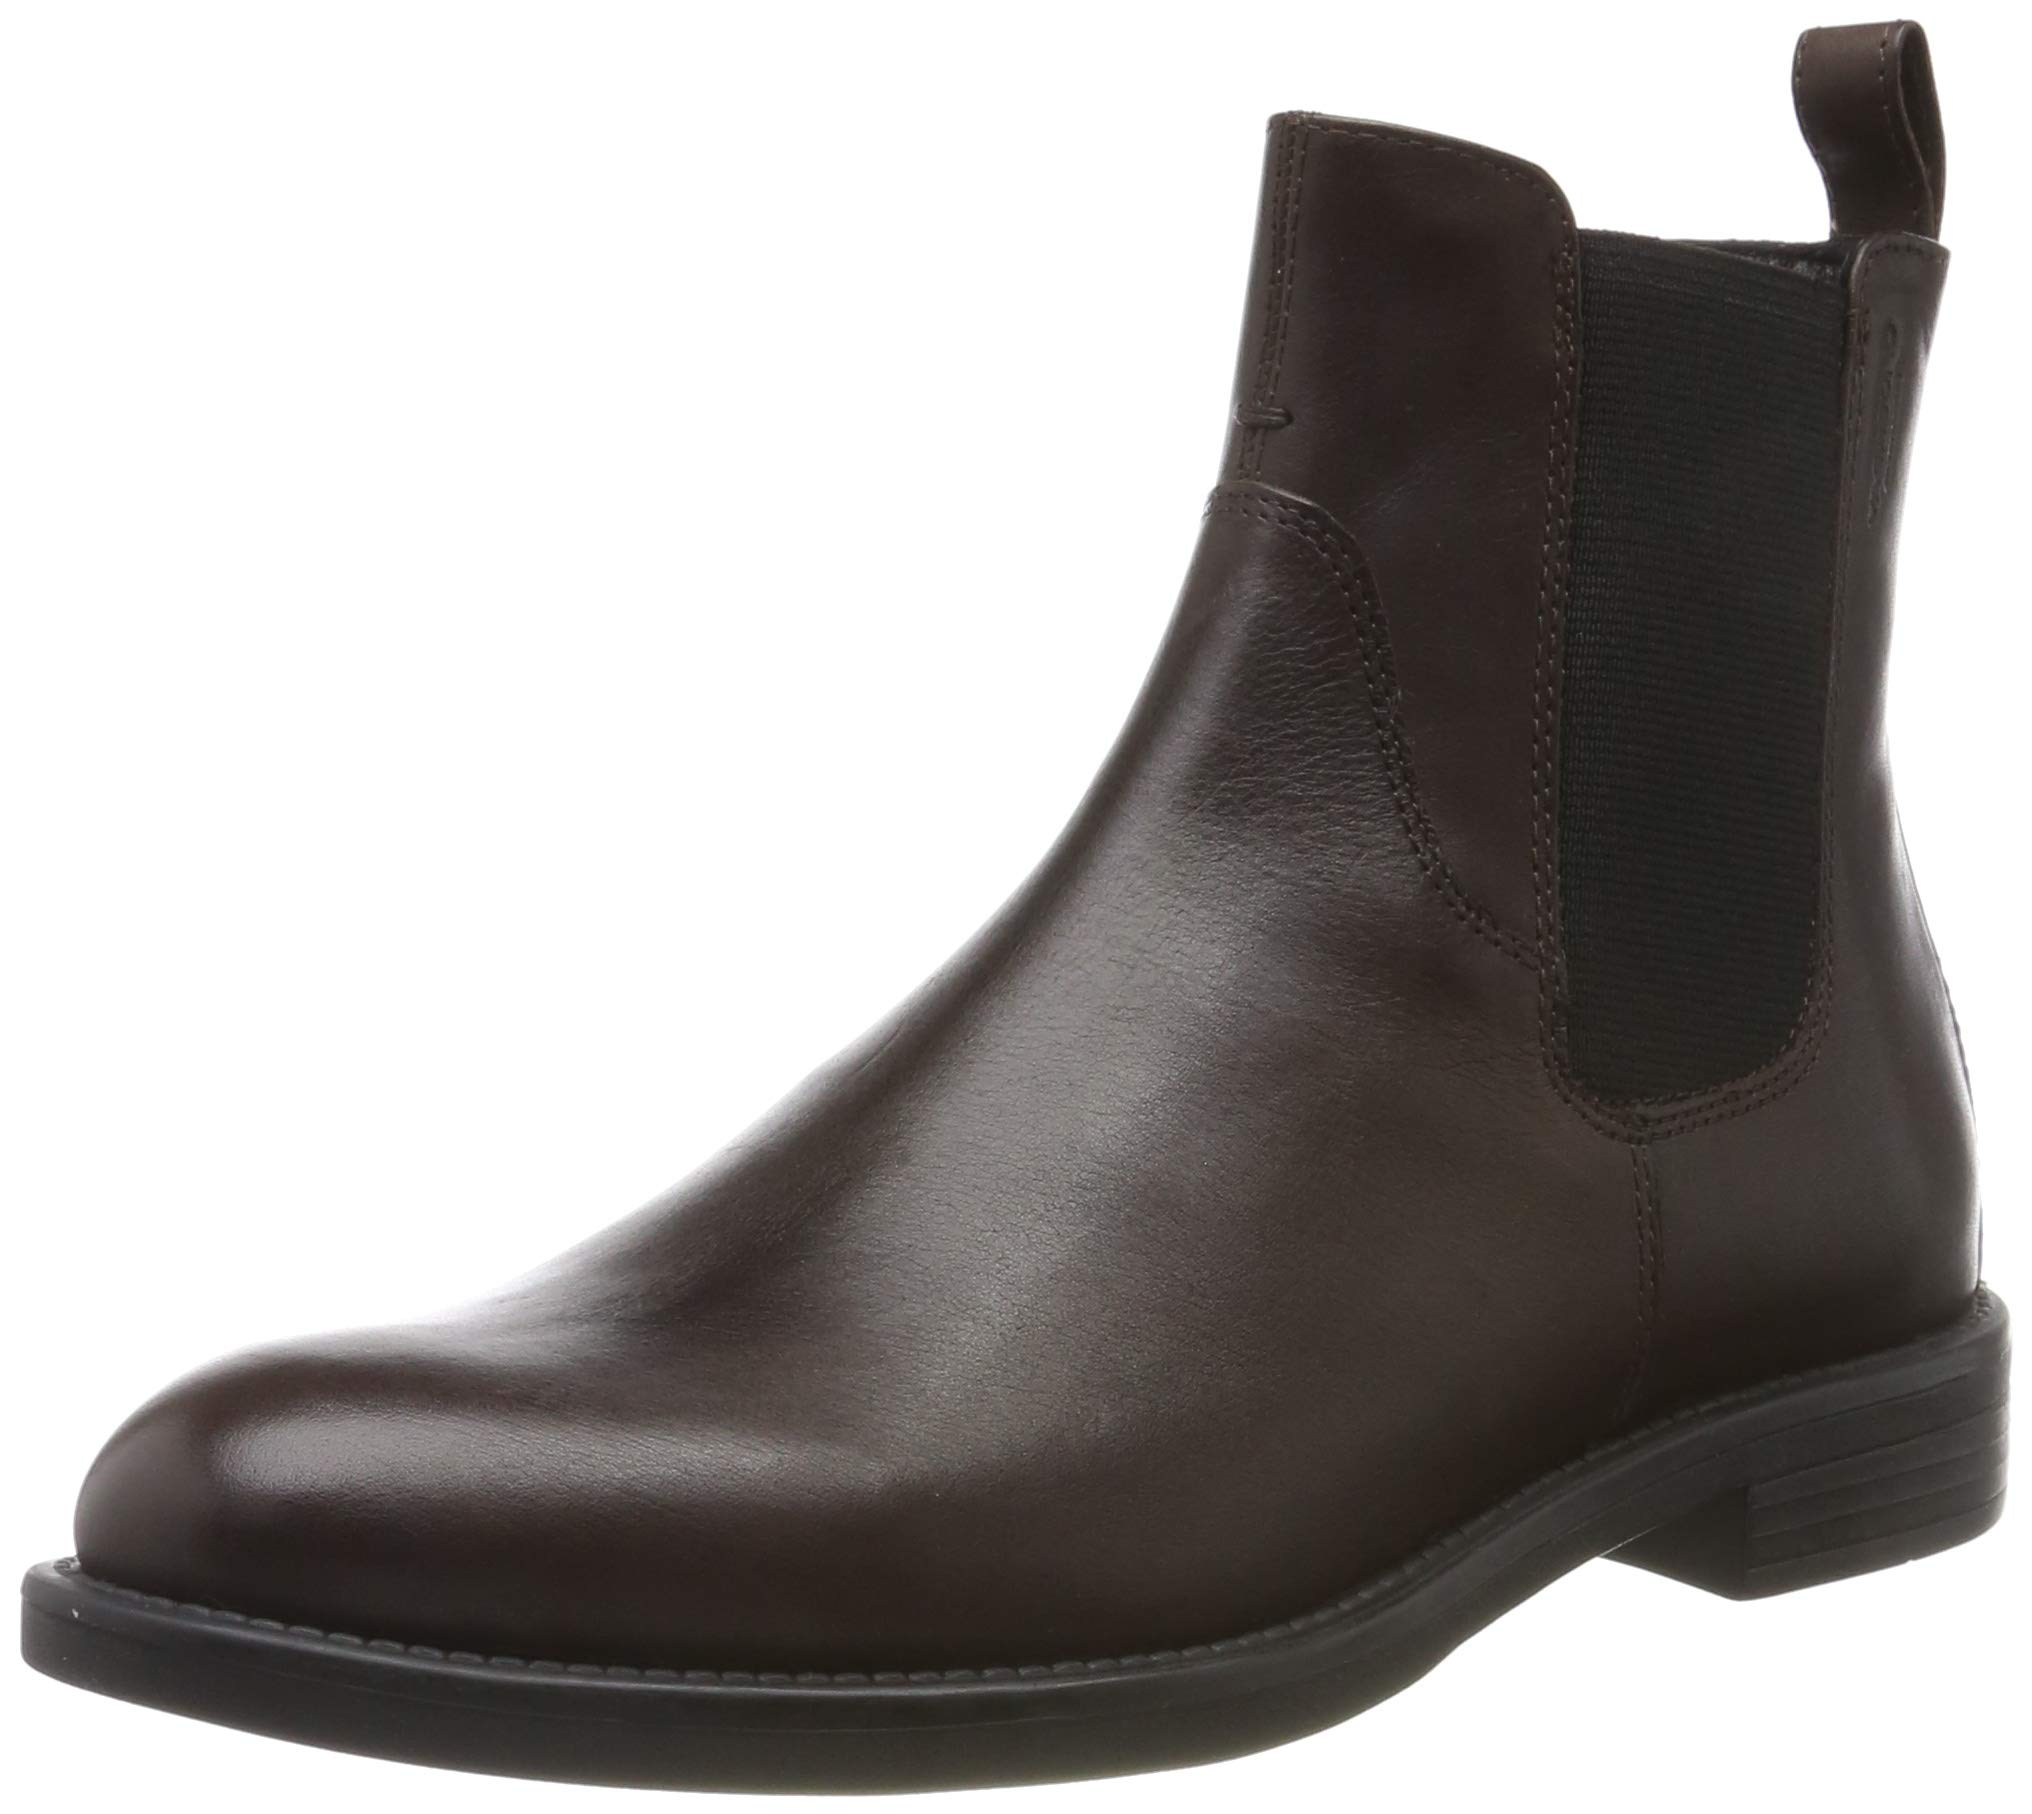 FemmeMarronespresso Boots Vagabond Eu 3635 AminaChelsea rChQdts